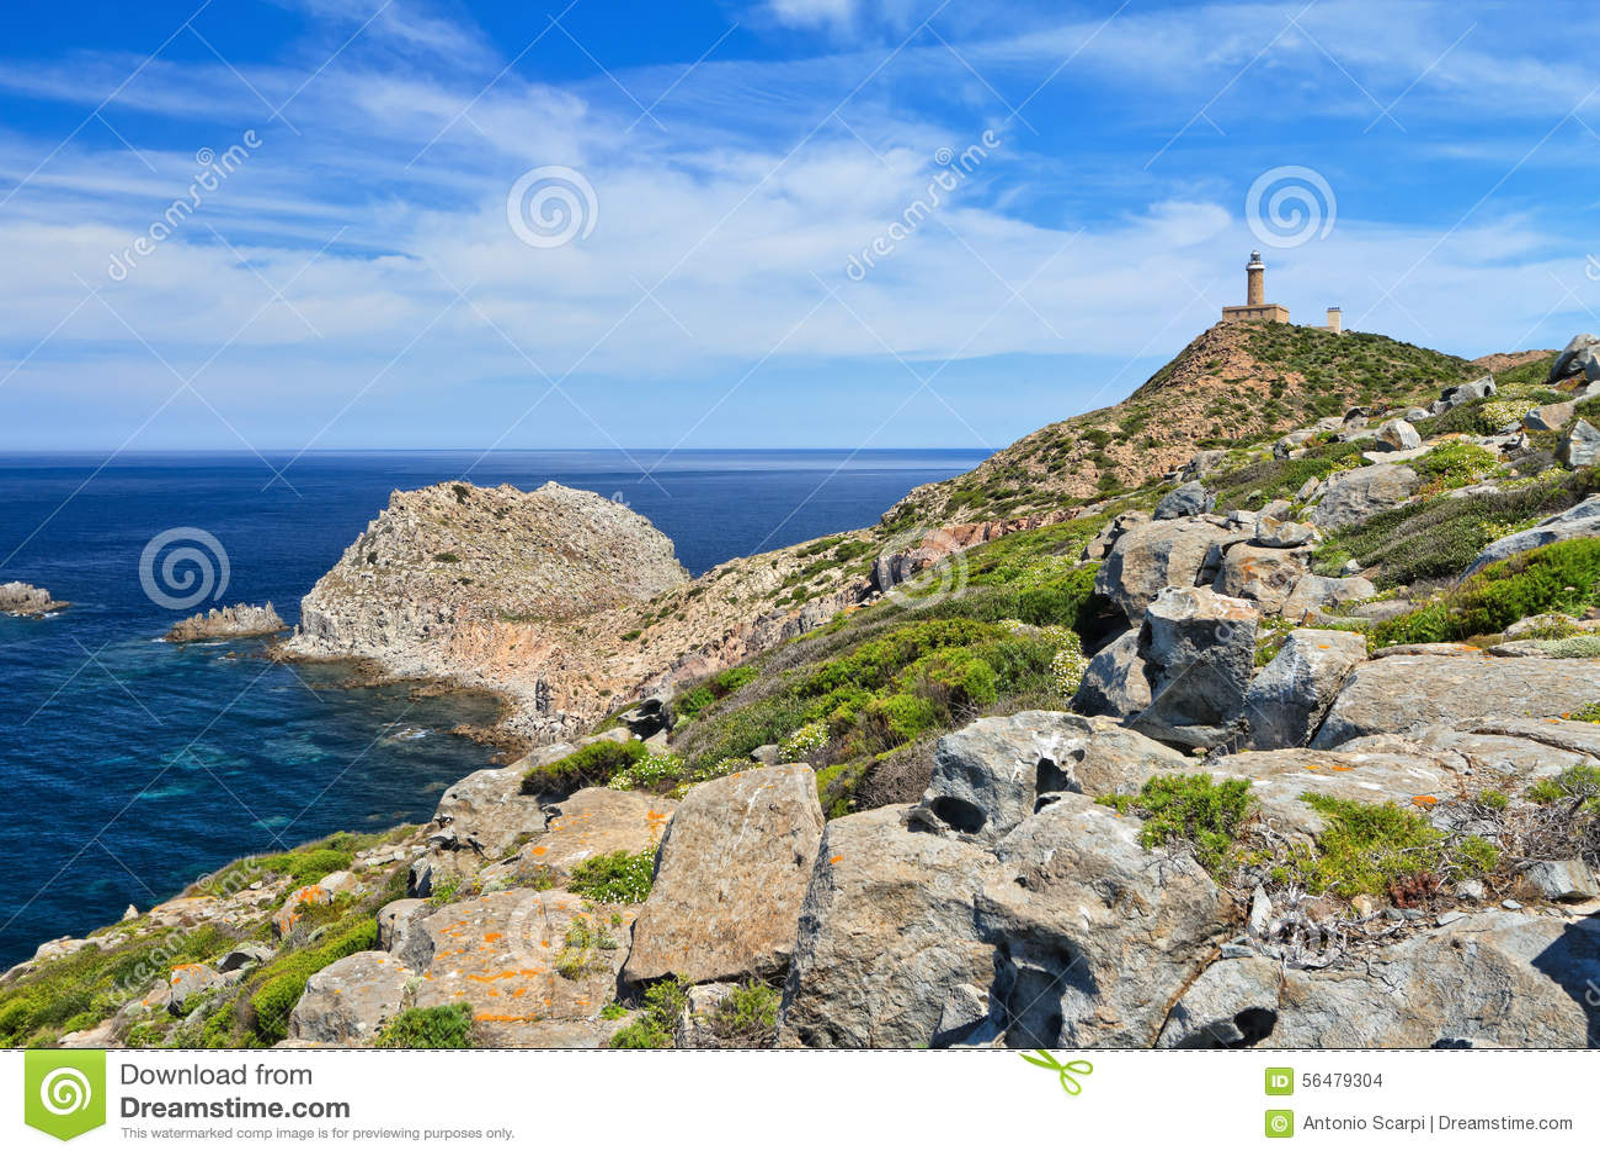 La Sardaigne - capo Sandalo avec le phare